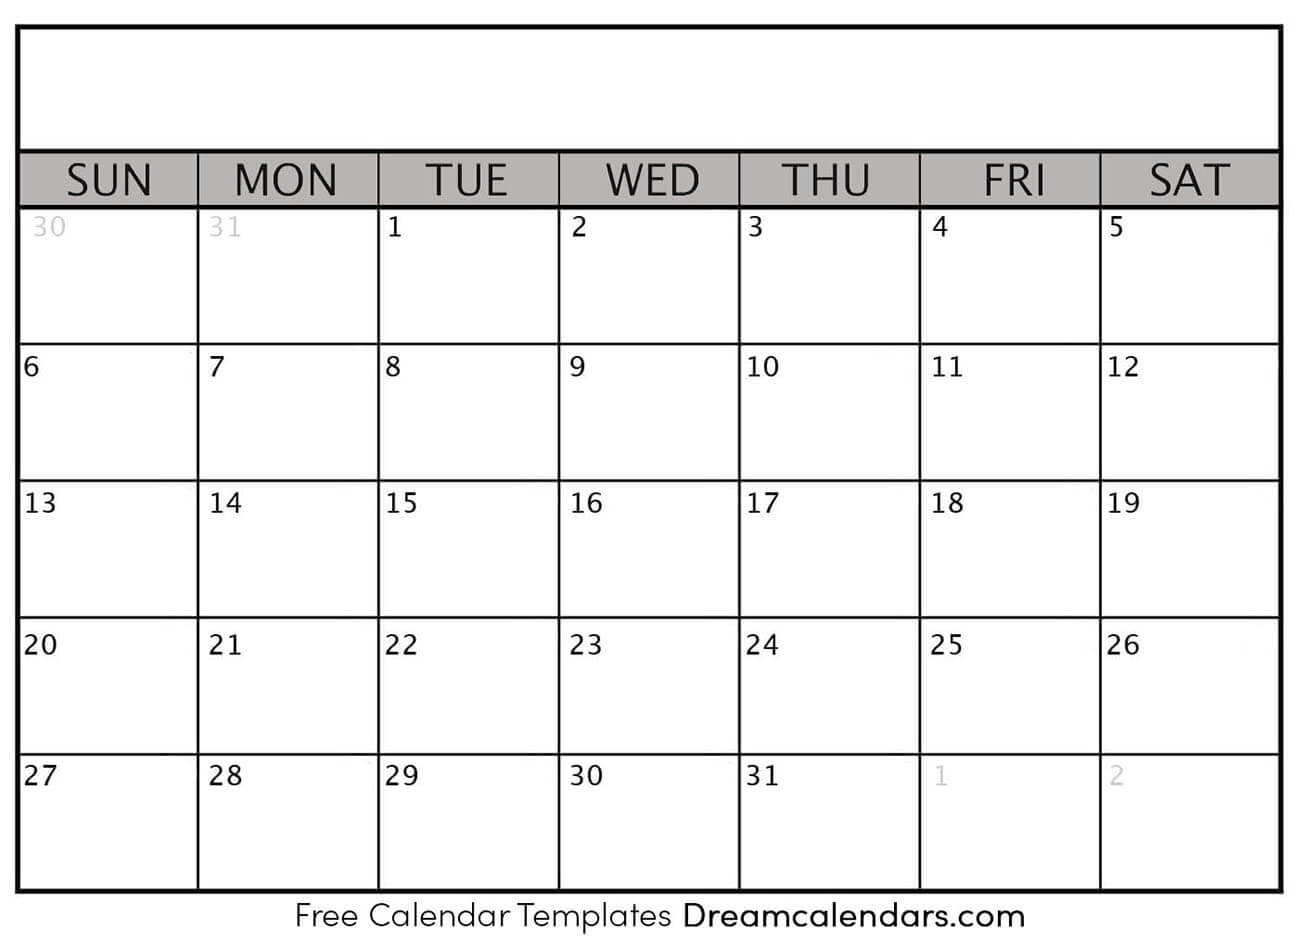 Printable Blank Calendar 2020 | Dream Calendars Exceptional Free Very Large Squares Blank Printable Calendar 2020 Monthly